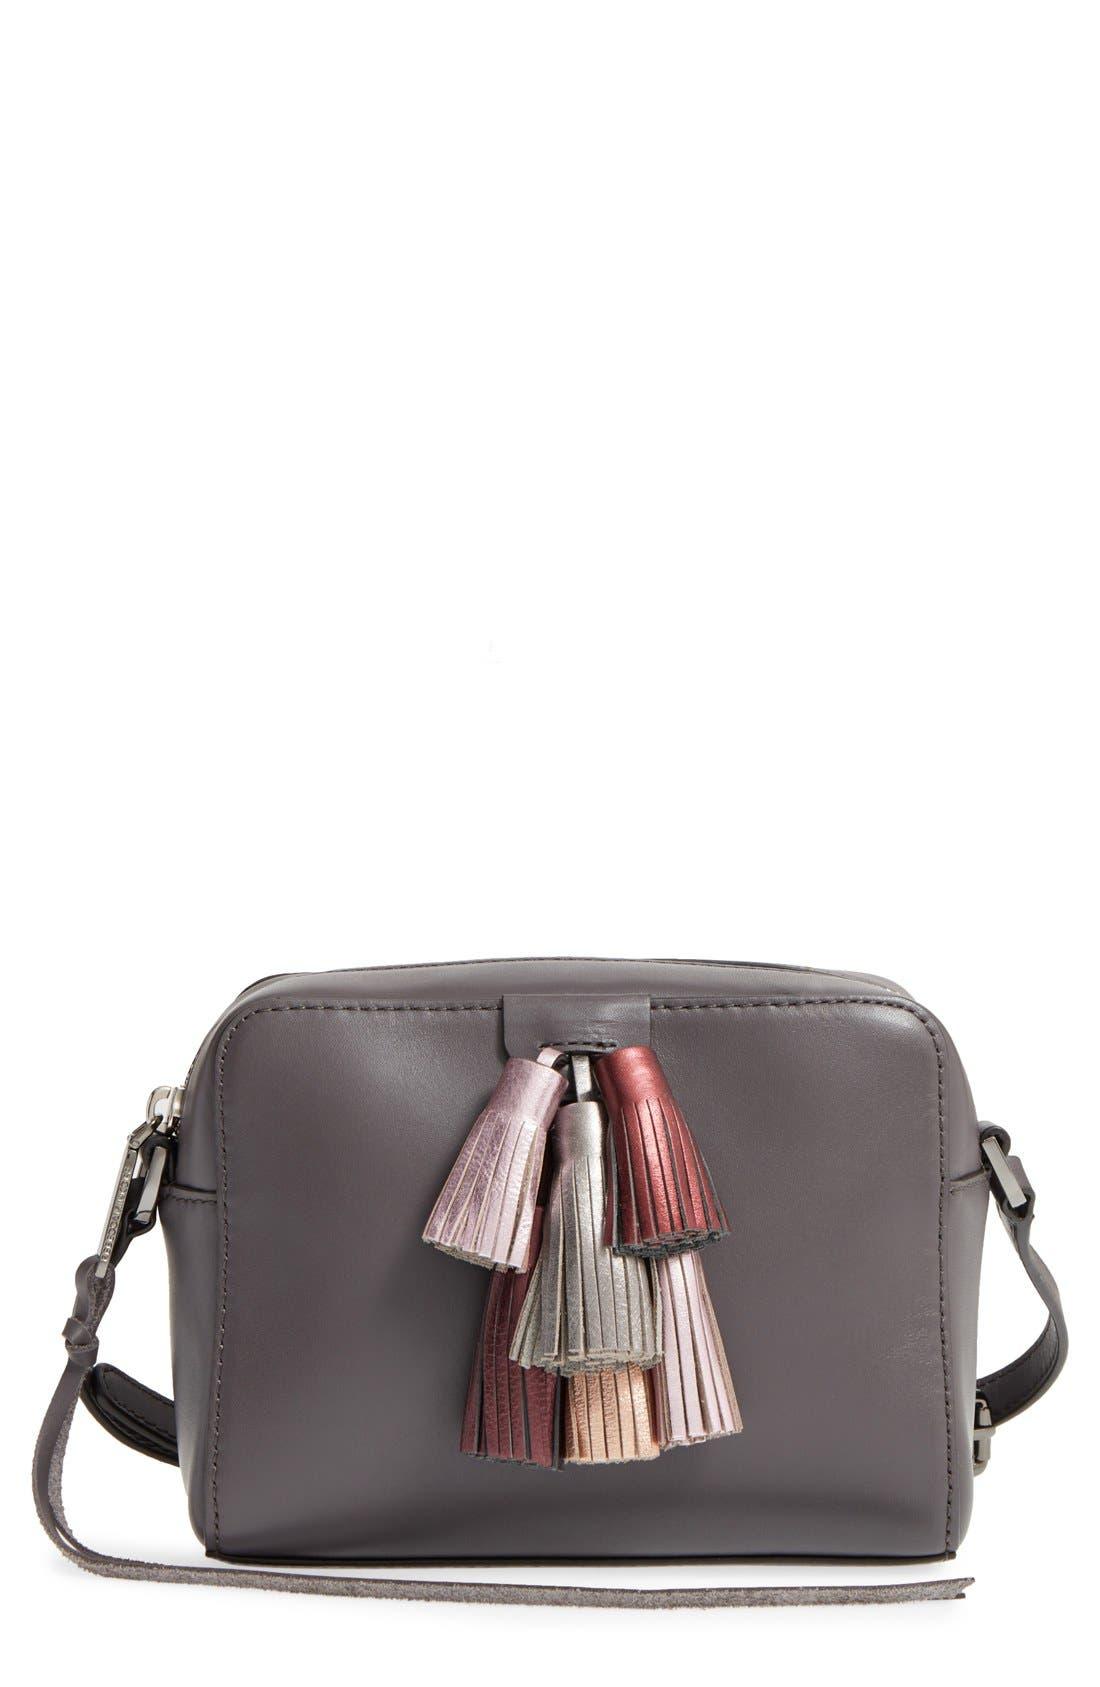 Alternate Image 1 Selected - Rebecca Minkoff Mini Sofia Leather Crossbody Bag